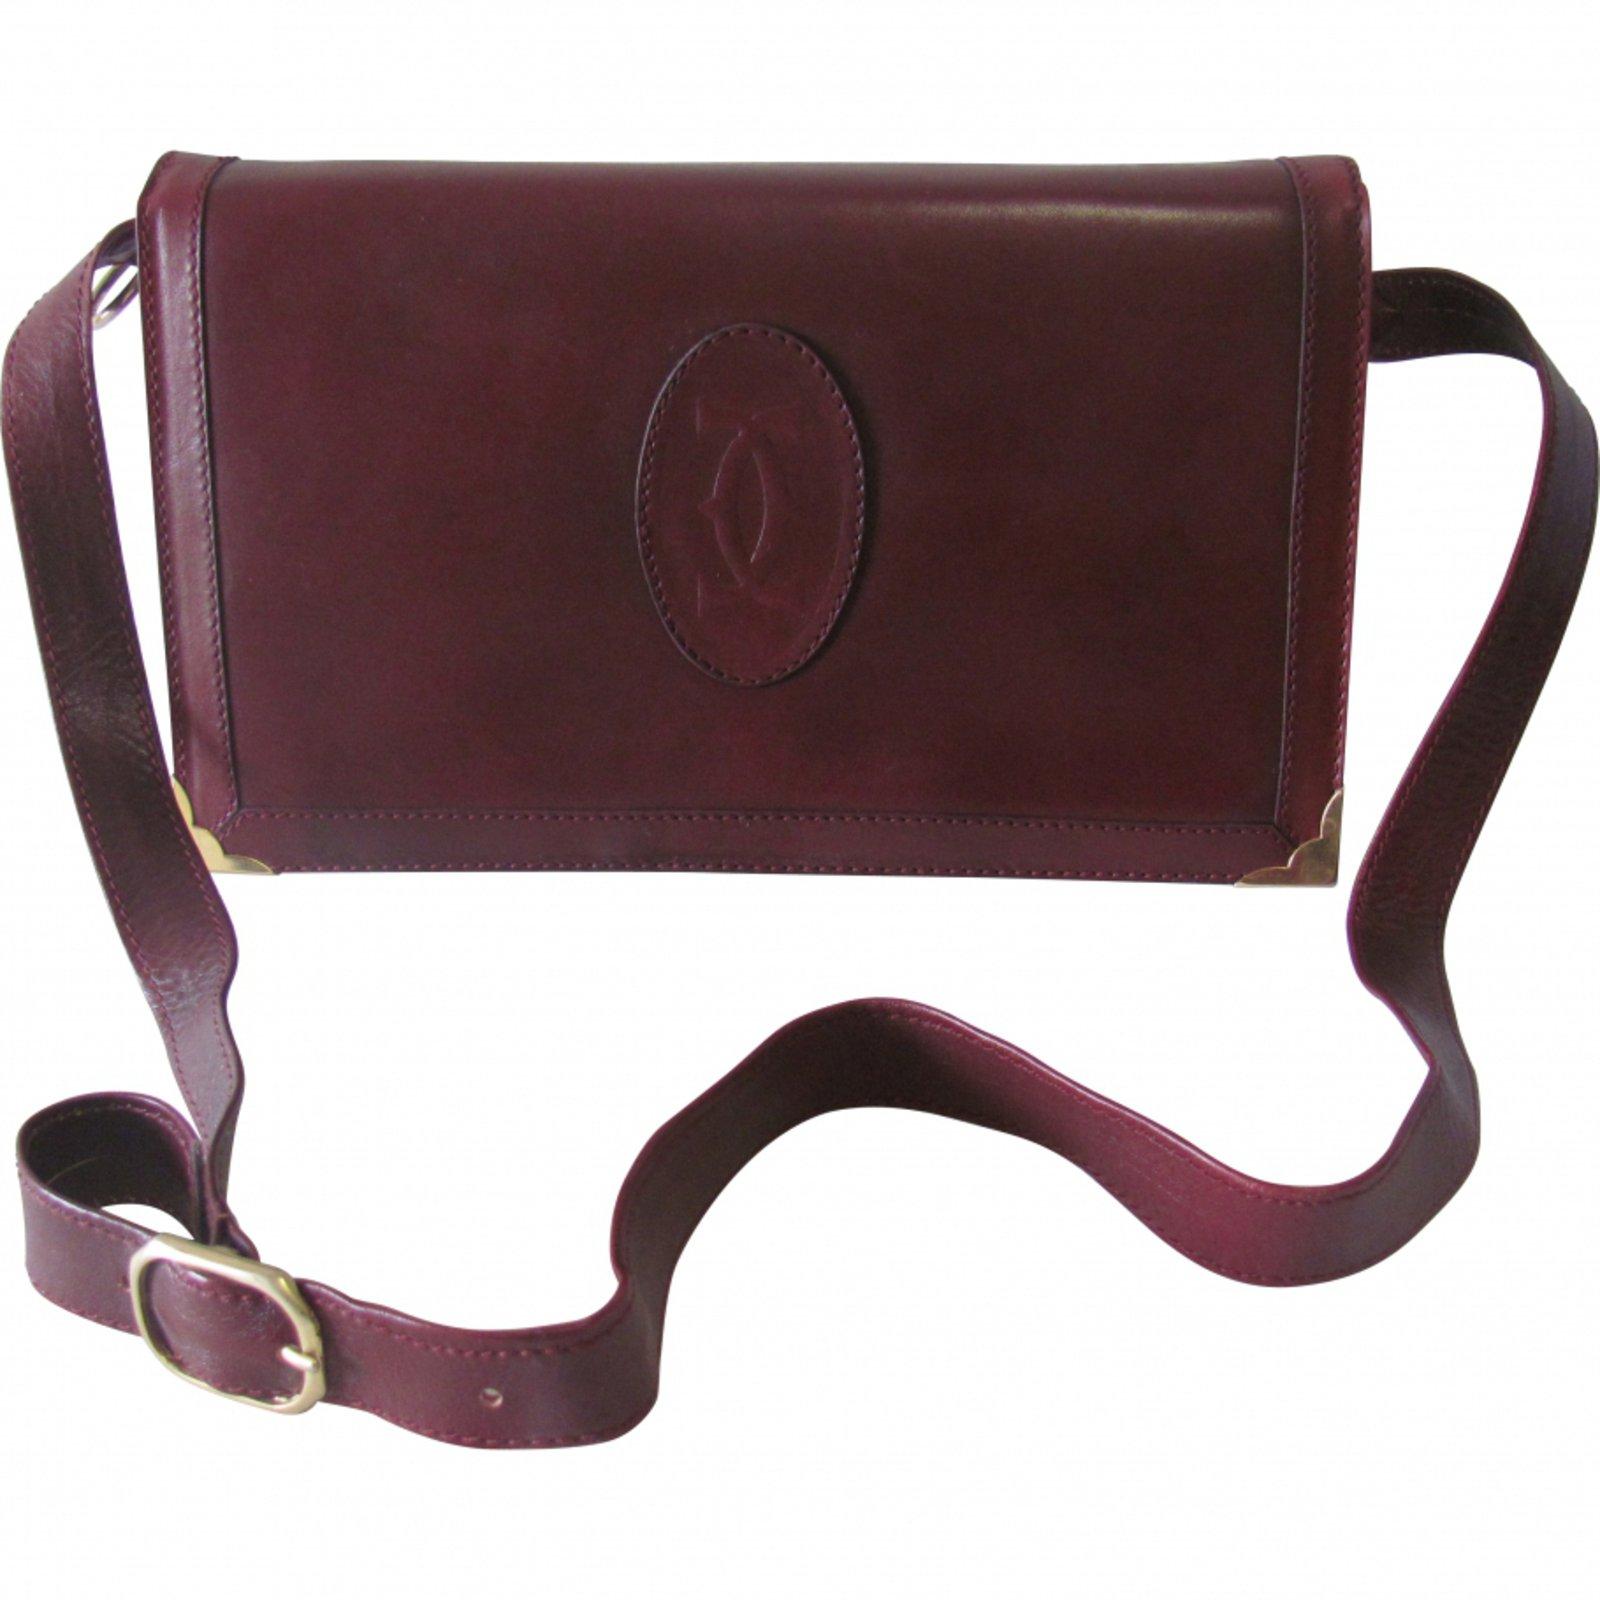 Cartier Handbags Leather Dark Red Ref 10000